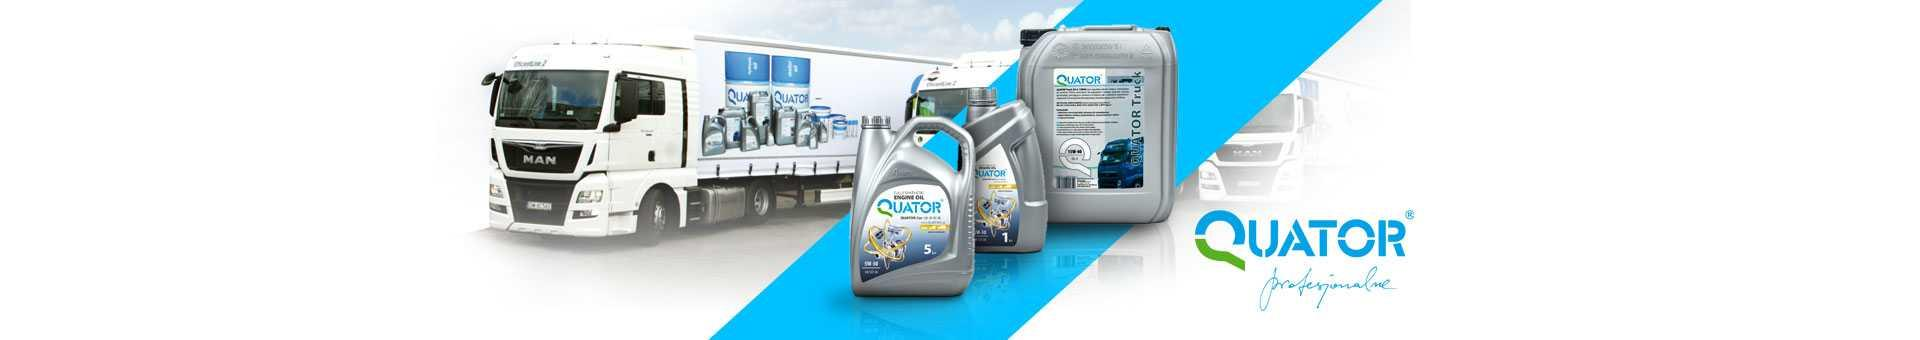 slidery quator 1 - Proauto